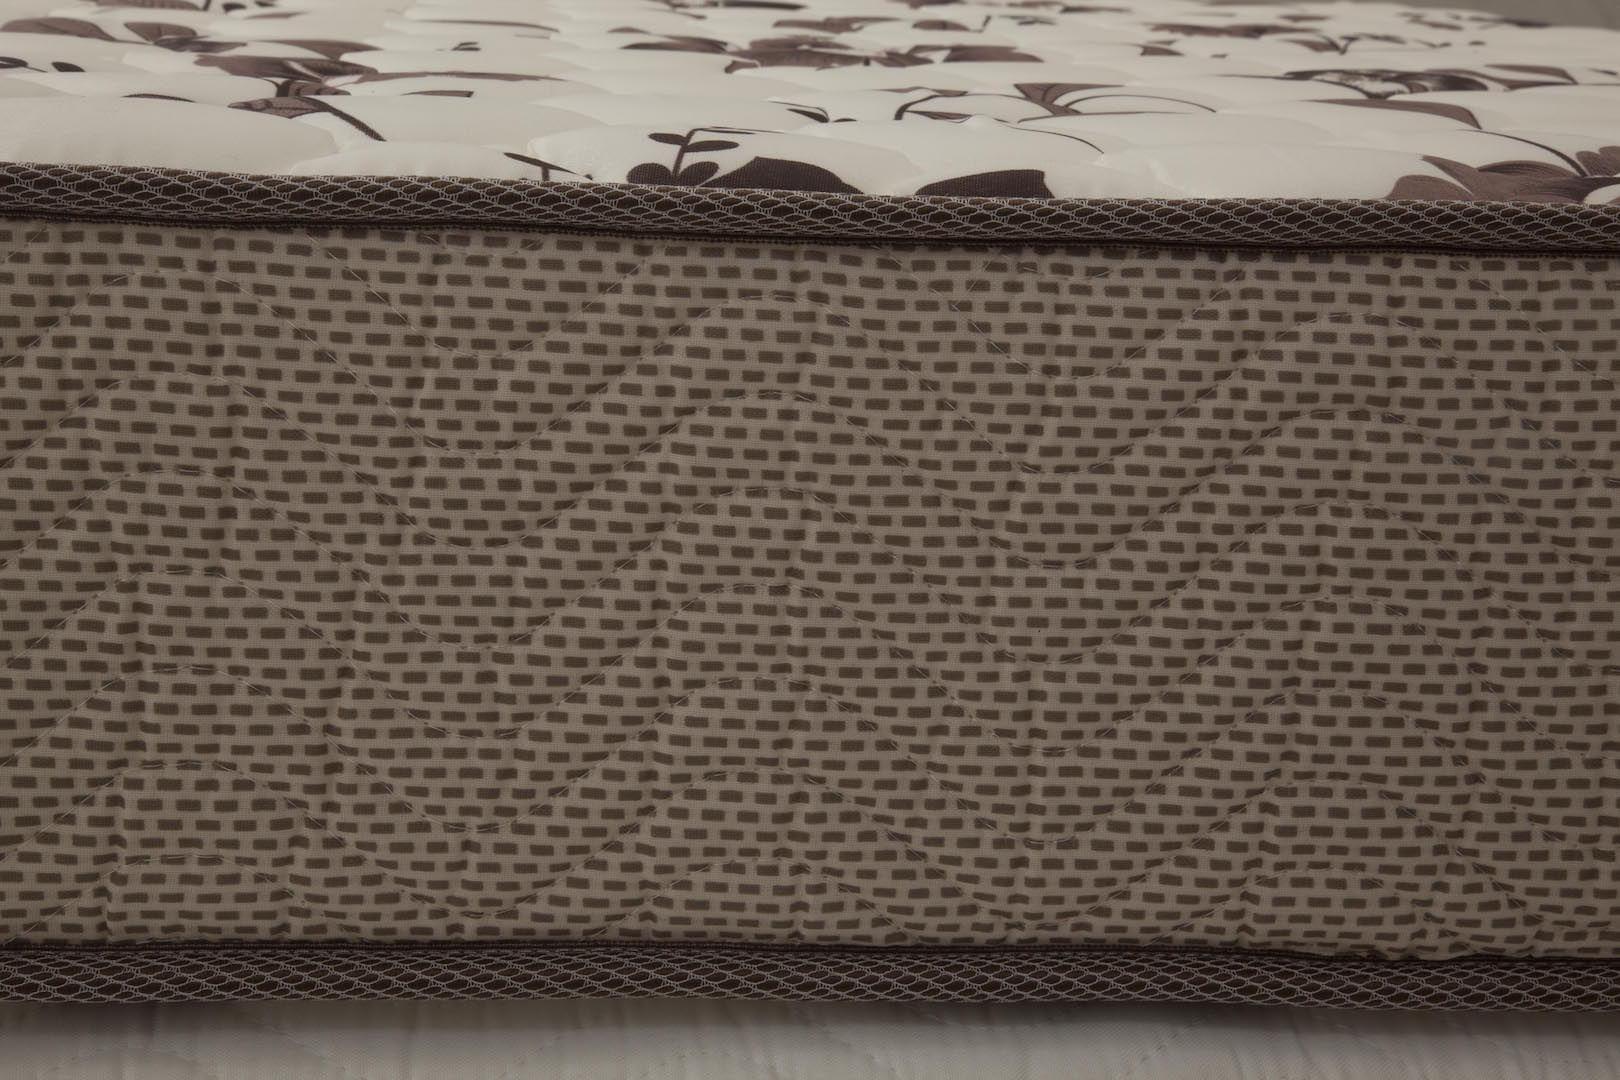 Colchao Physical Mega Resistente Viuva 128 cm (LARG) Branco - 52718